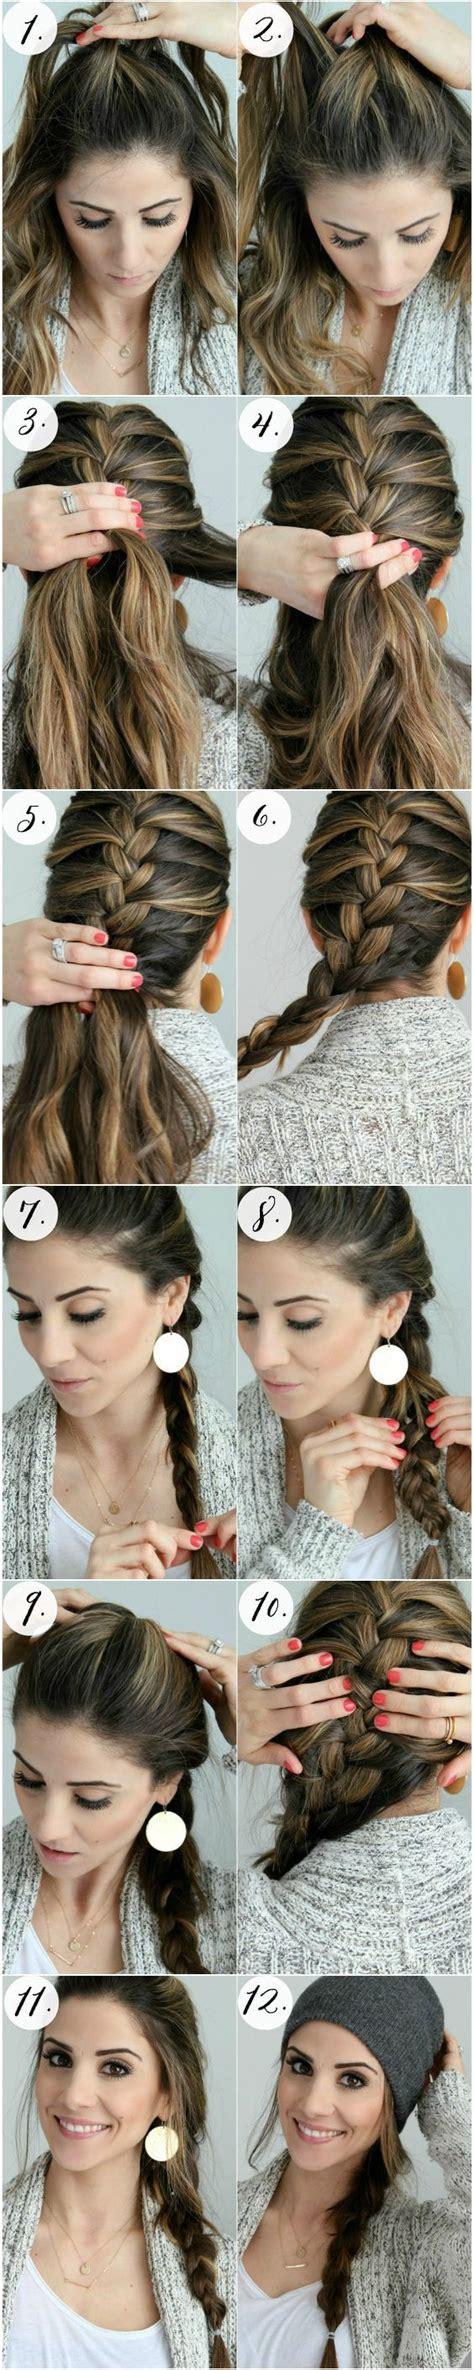 easy diy bridal hairstyles hr 3 pinterest best 25 braided crown hairstyles ideas on pinterest